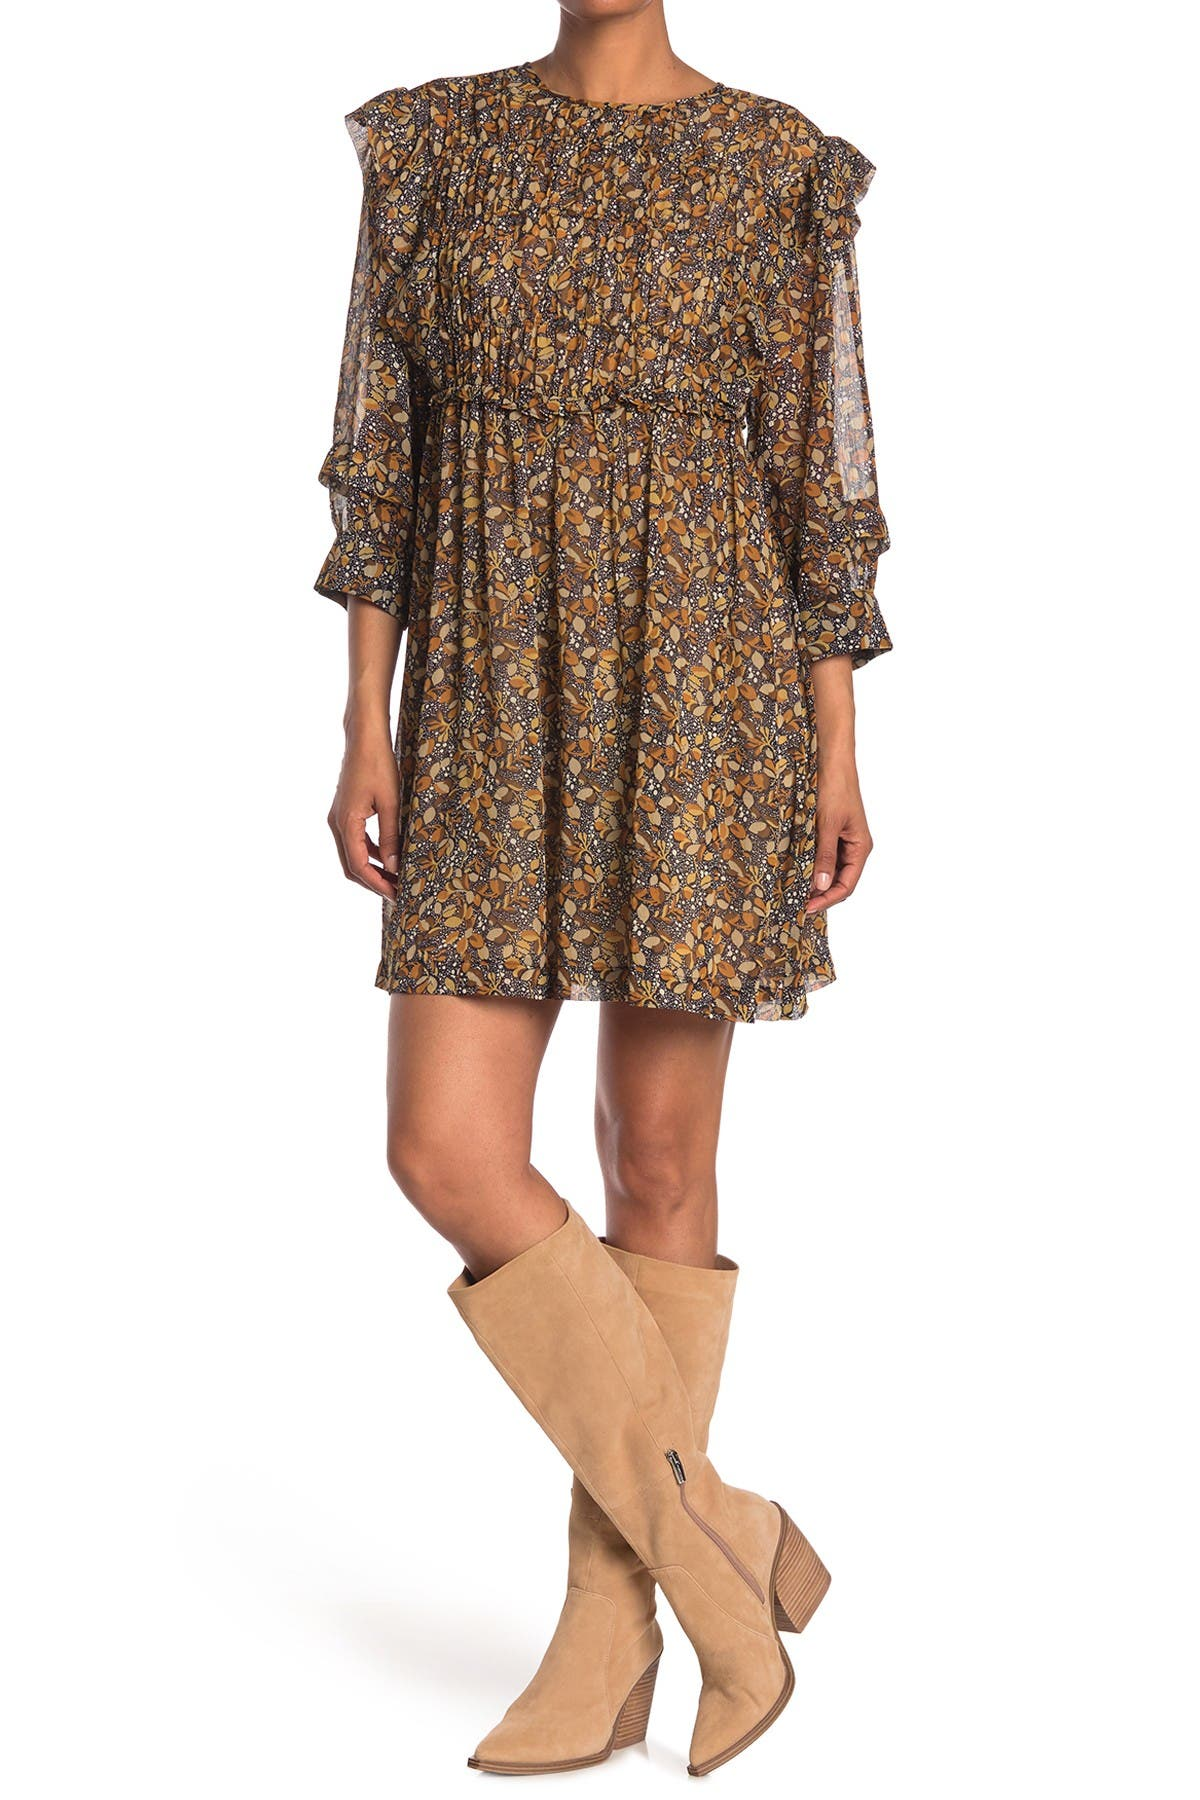 Image of ba&sh Sand Ruffle Trim Dress